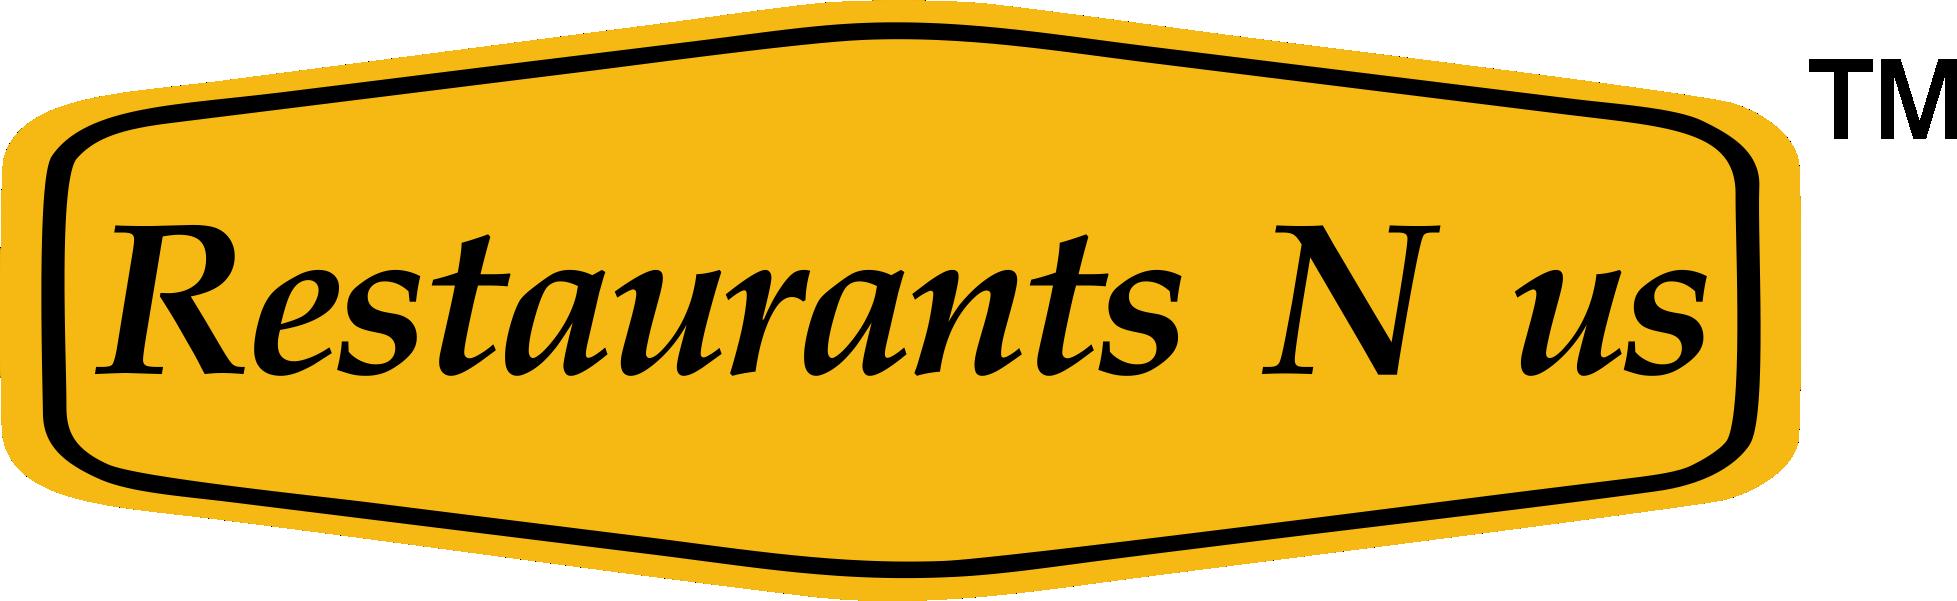 Restaurants N Us